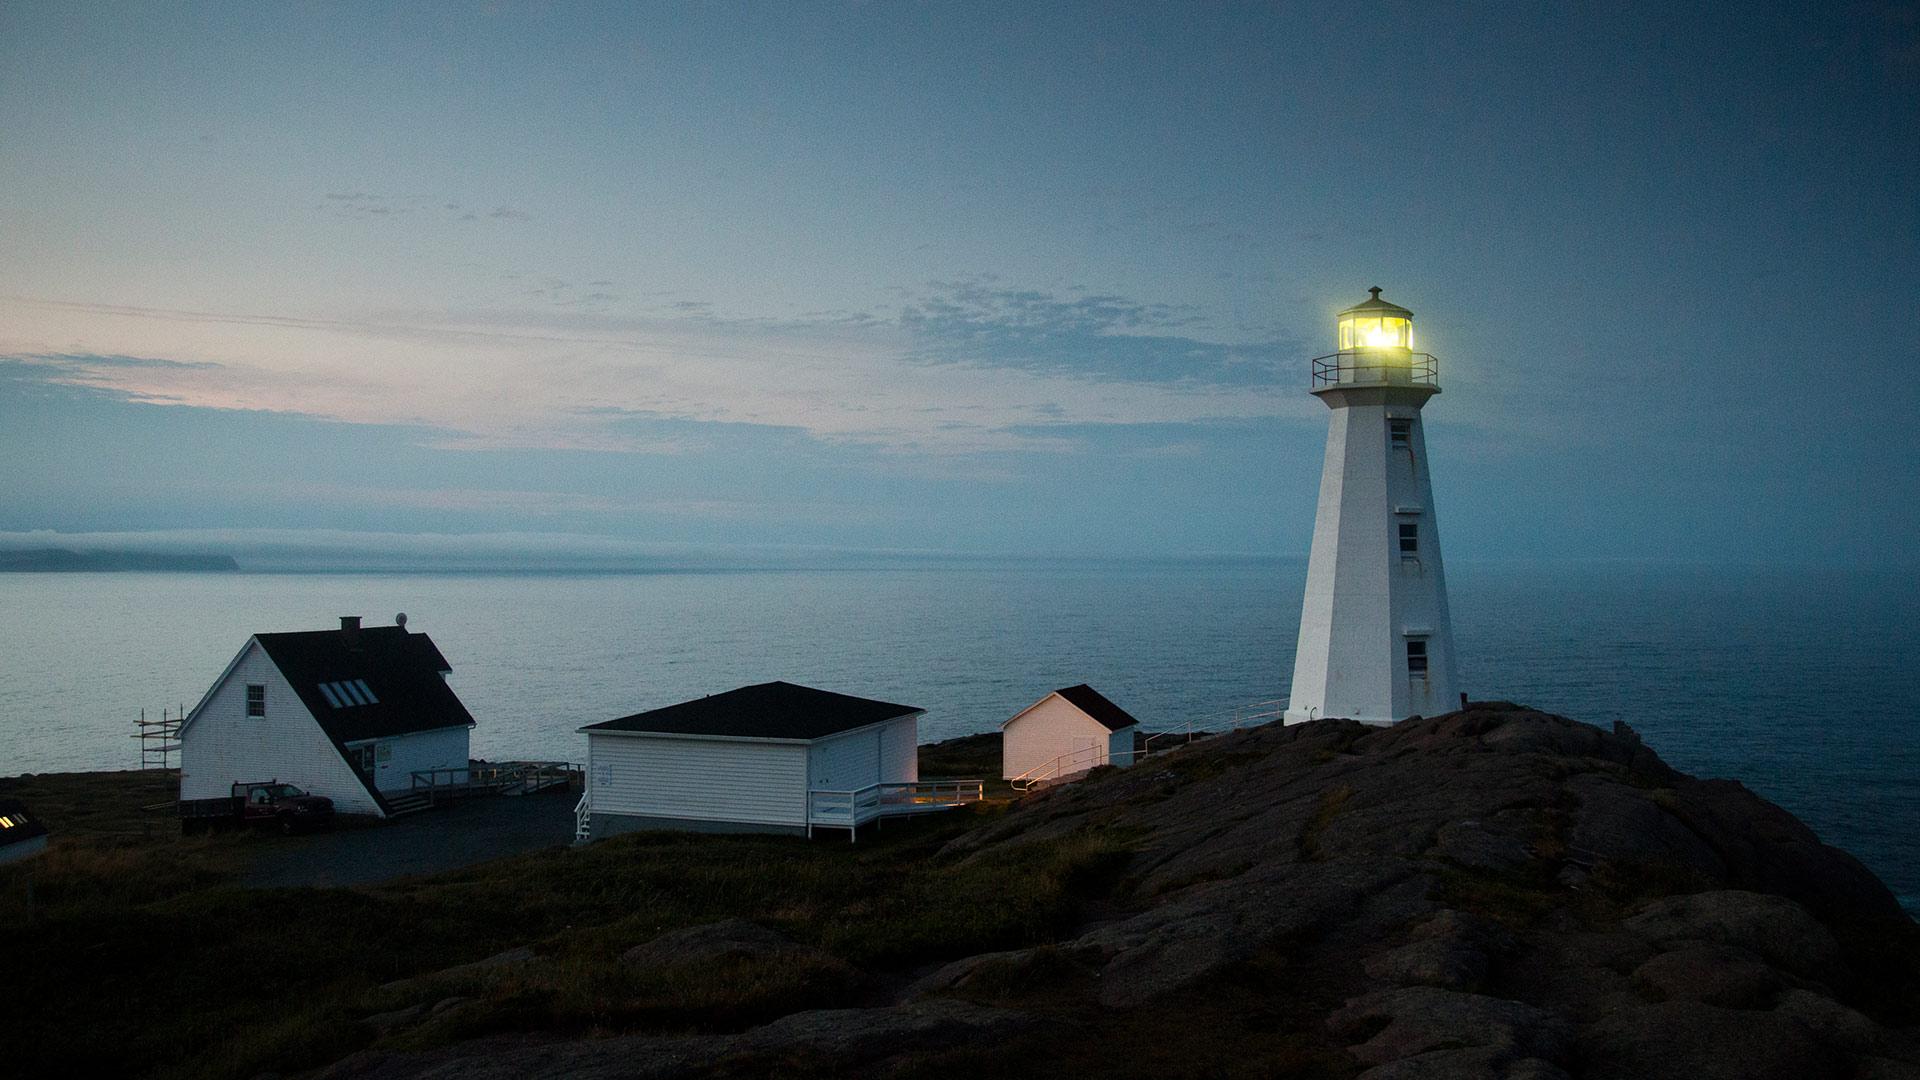 Avalon Lighthouse Bing Wallpaper Download 1920x1080